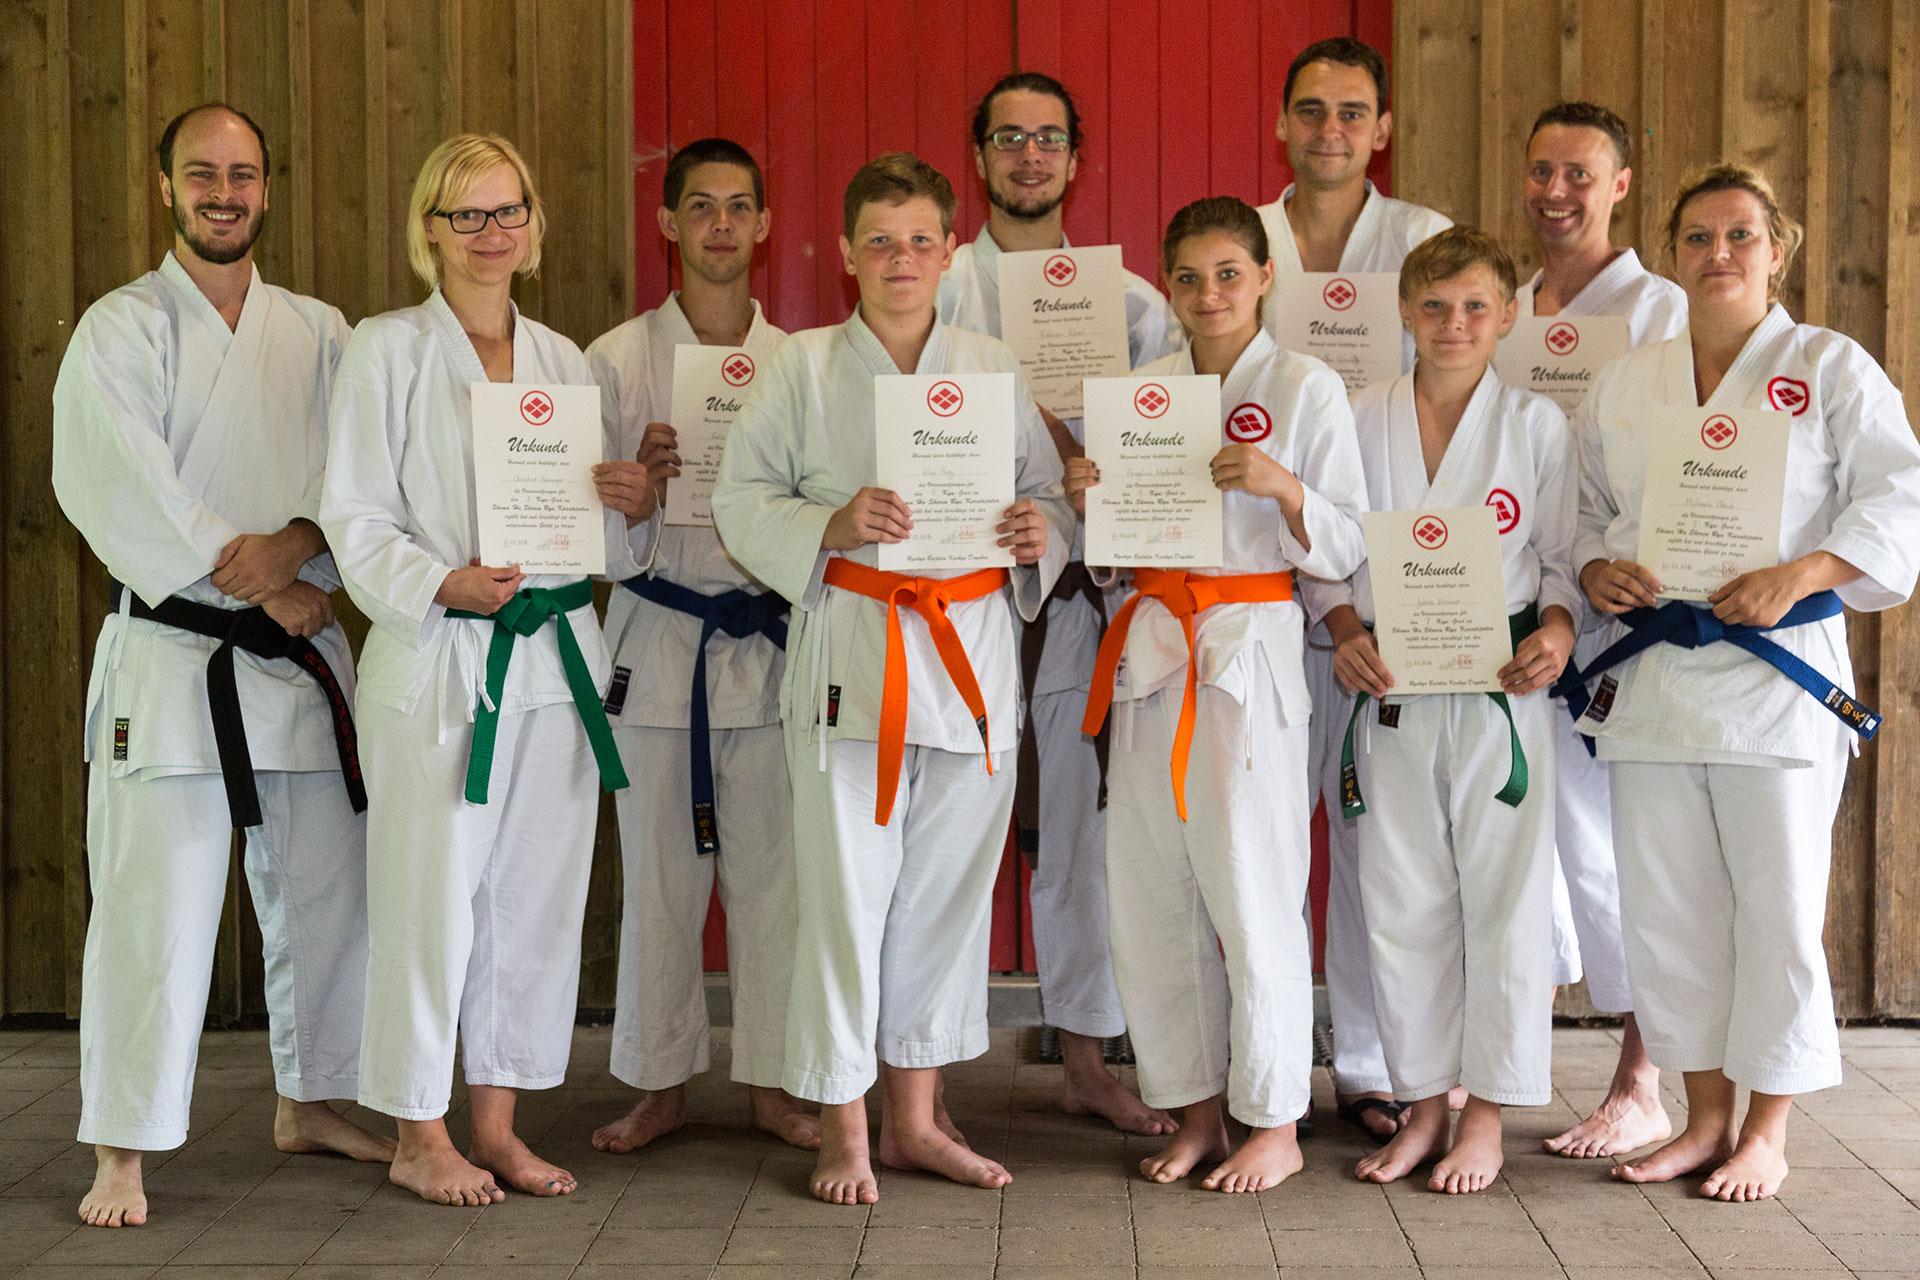 2016-07-24 Kyu-Pruefung 16-4 Karate